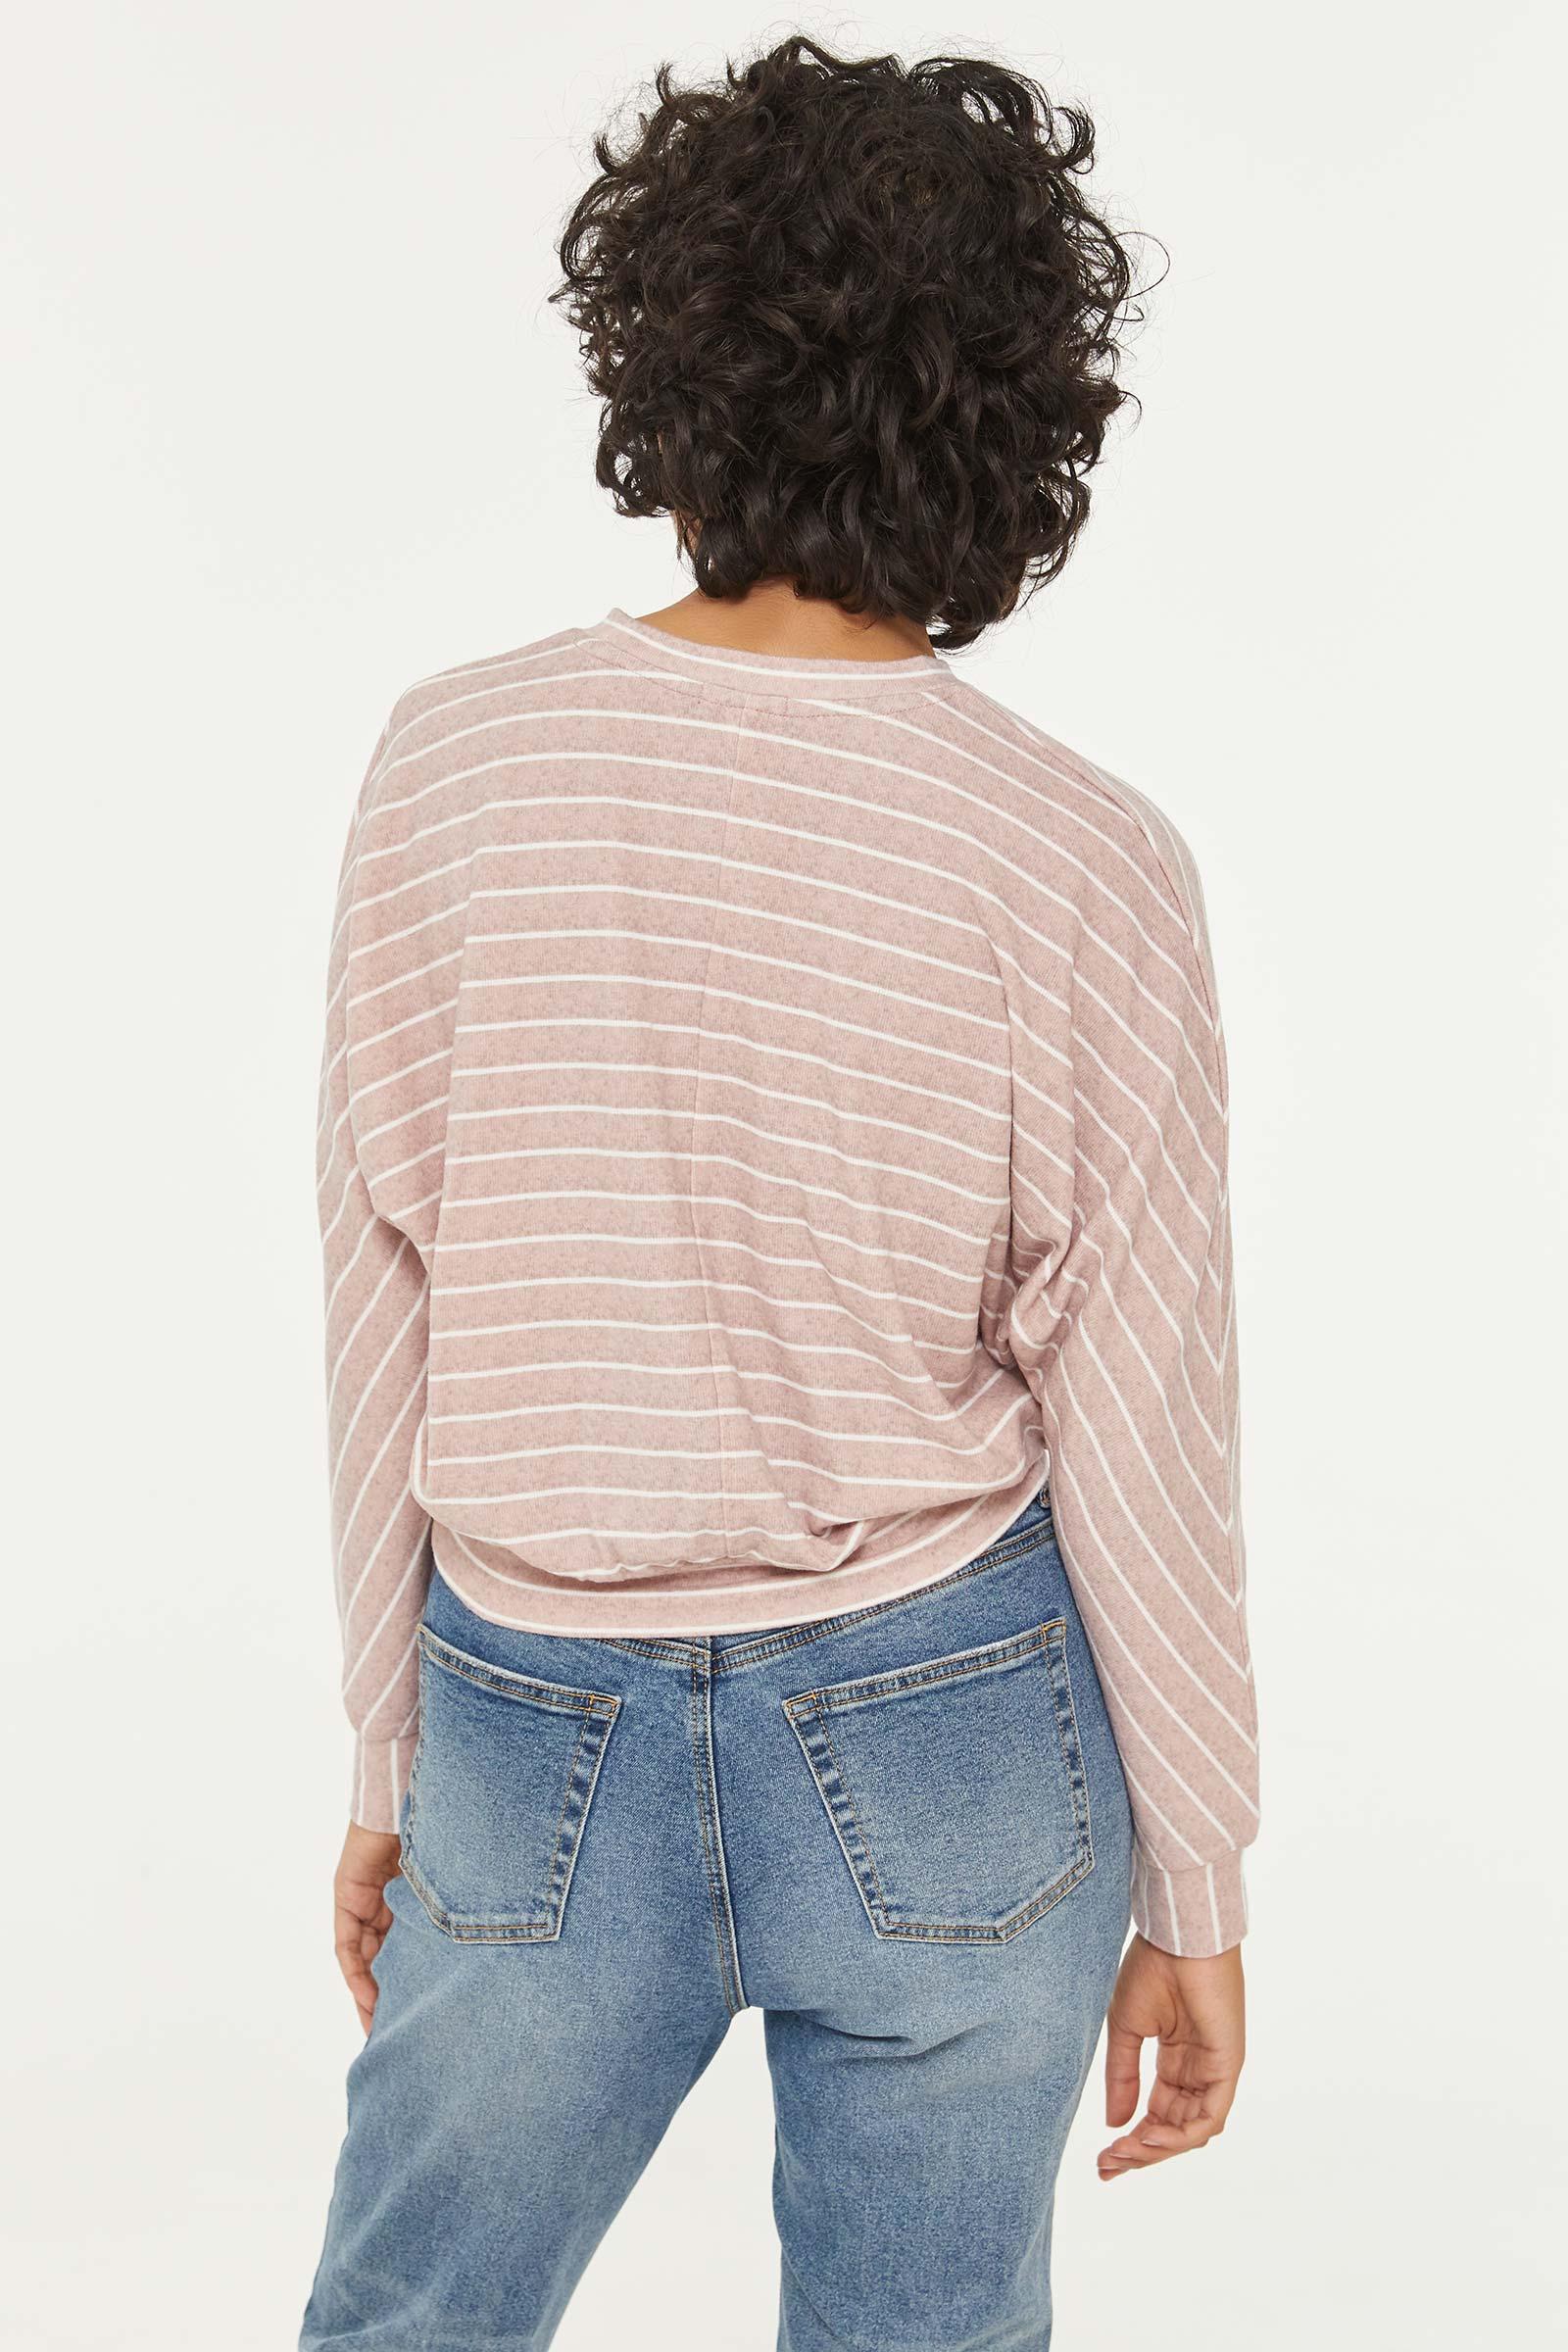 Brushed Striped Dolman Sweater